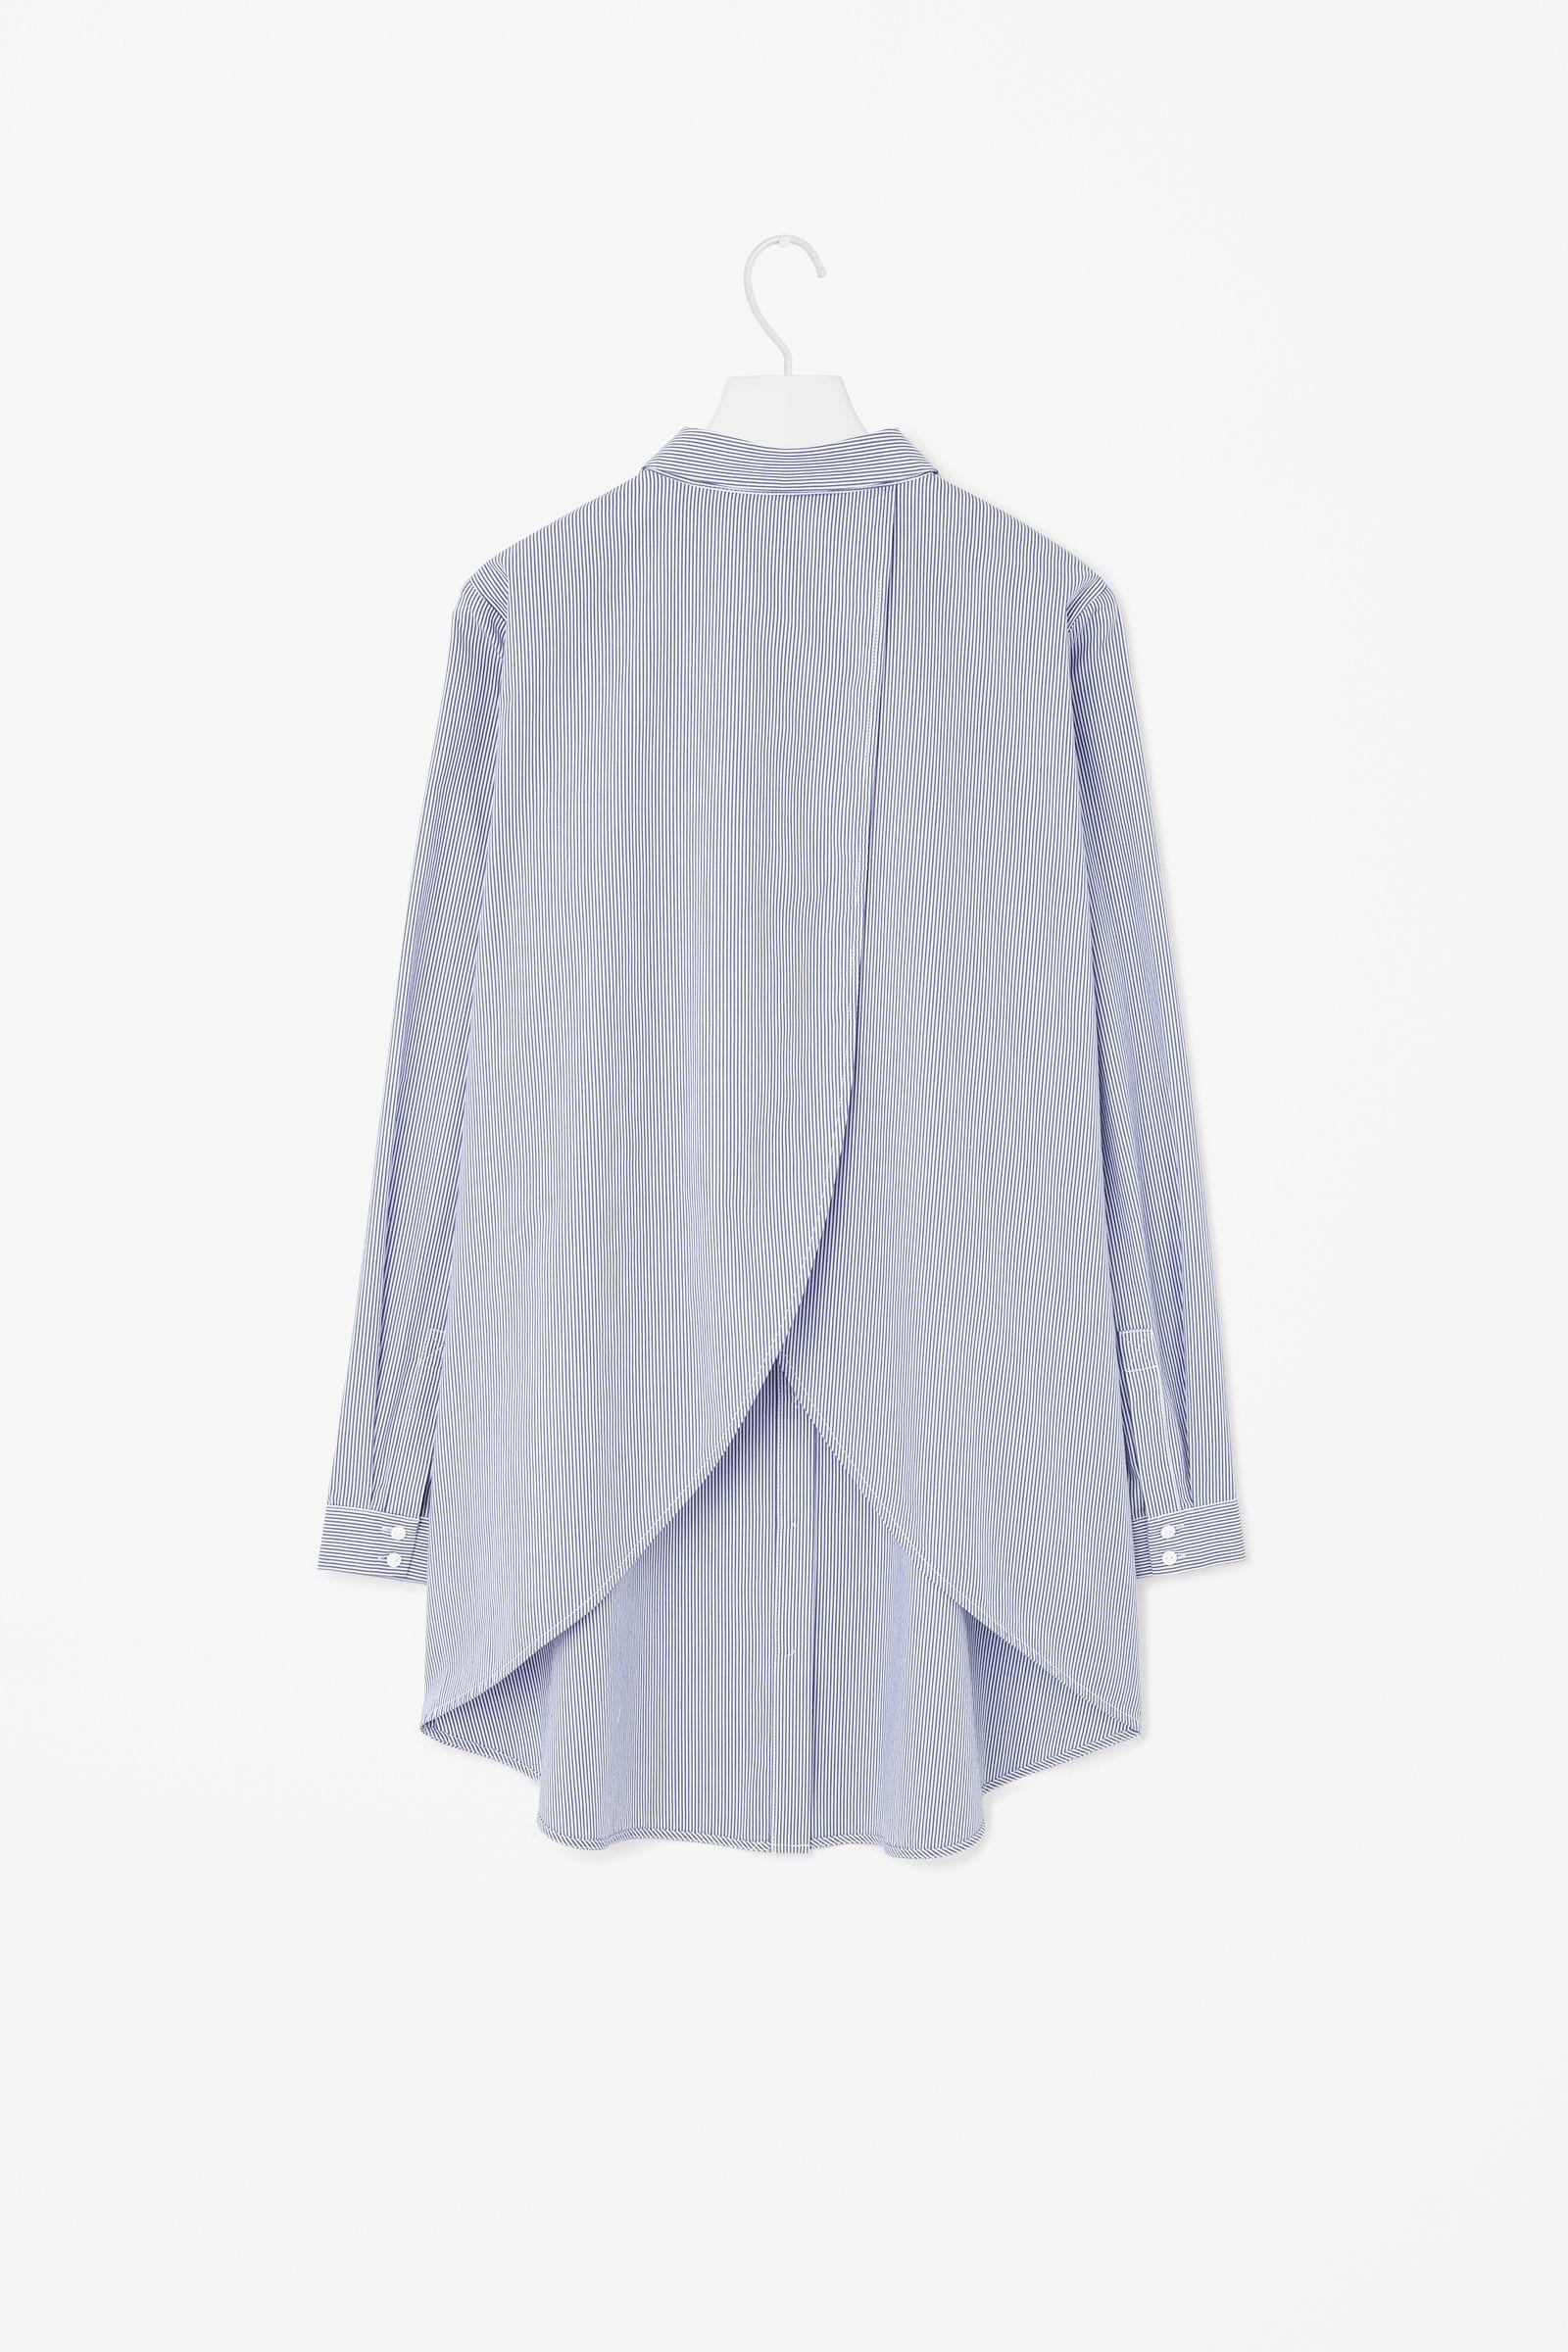 67c84fb4a8e Maxi Shirt Dress Shopstyle Uk - raveitsafe